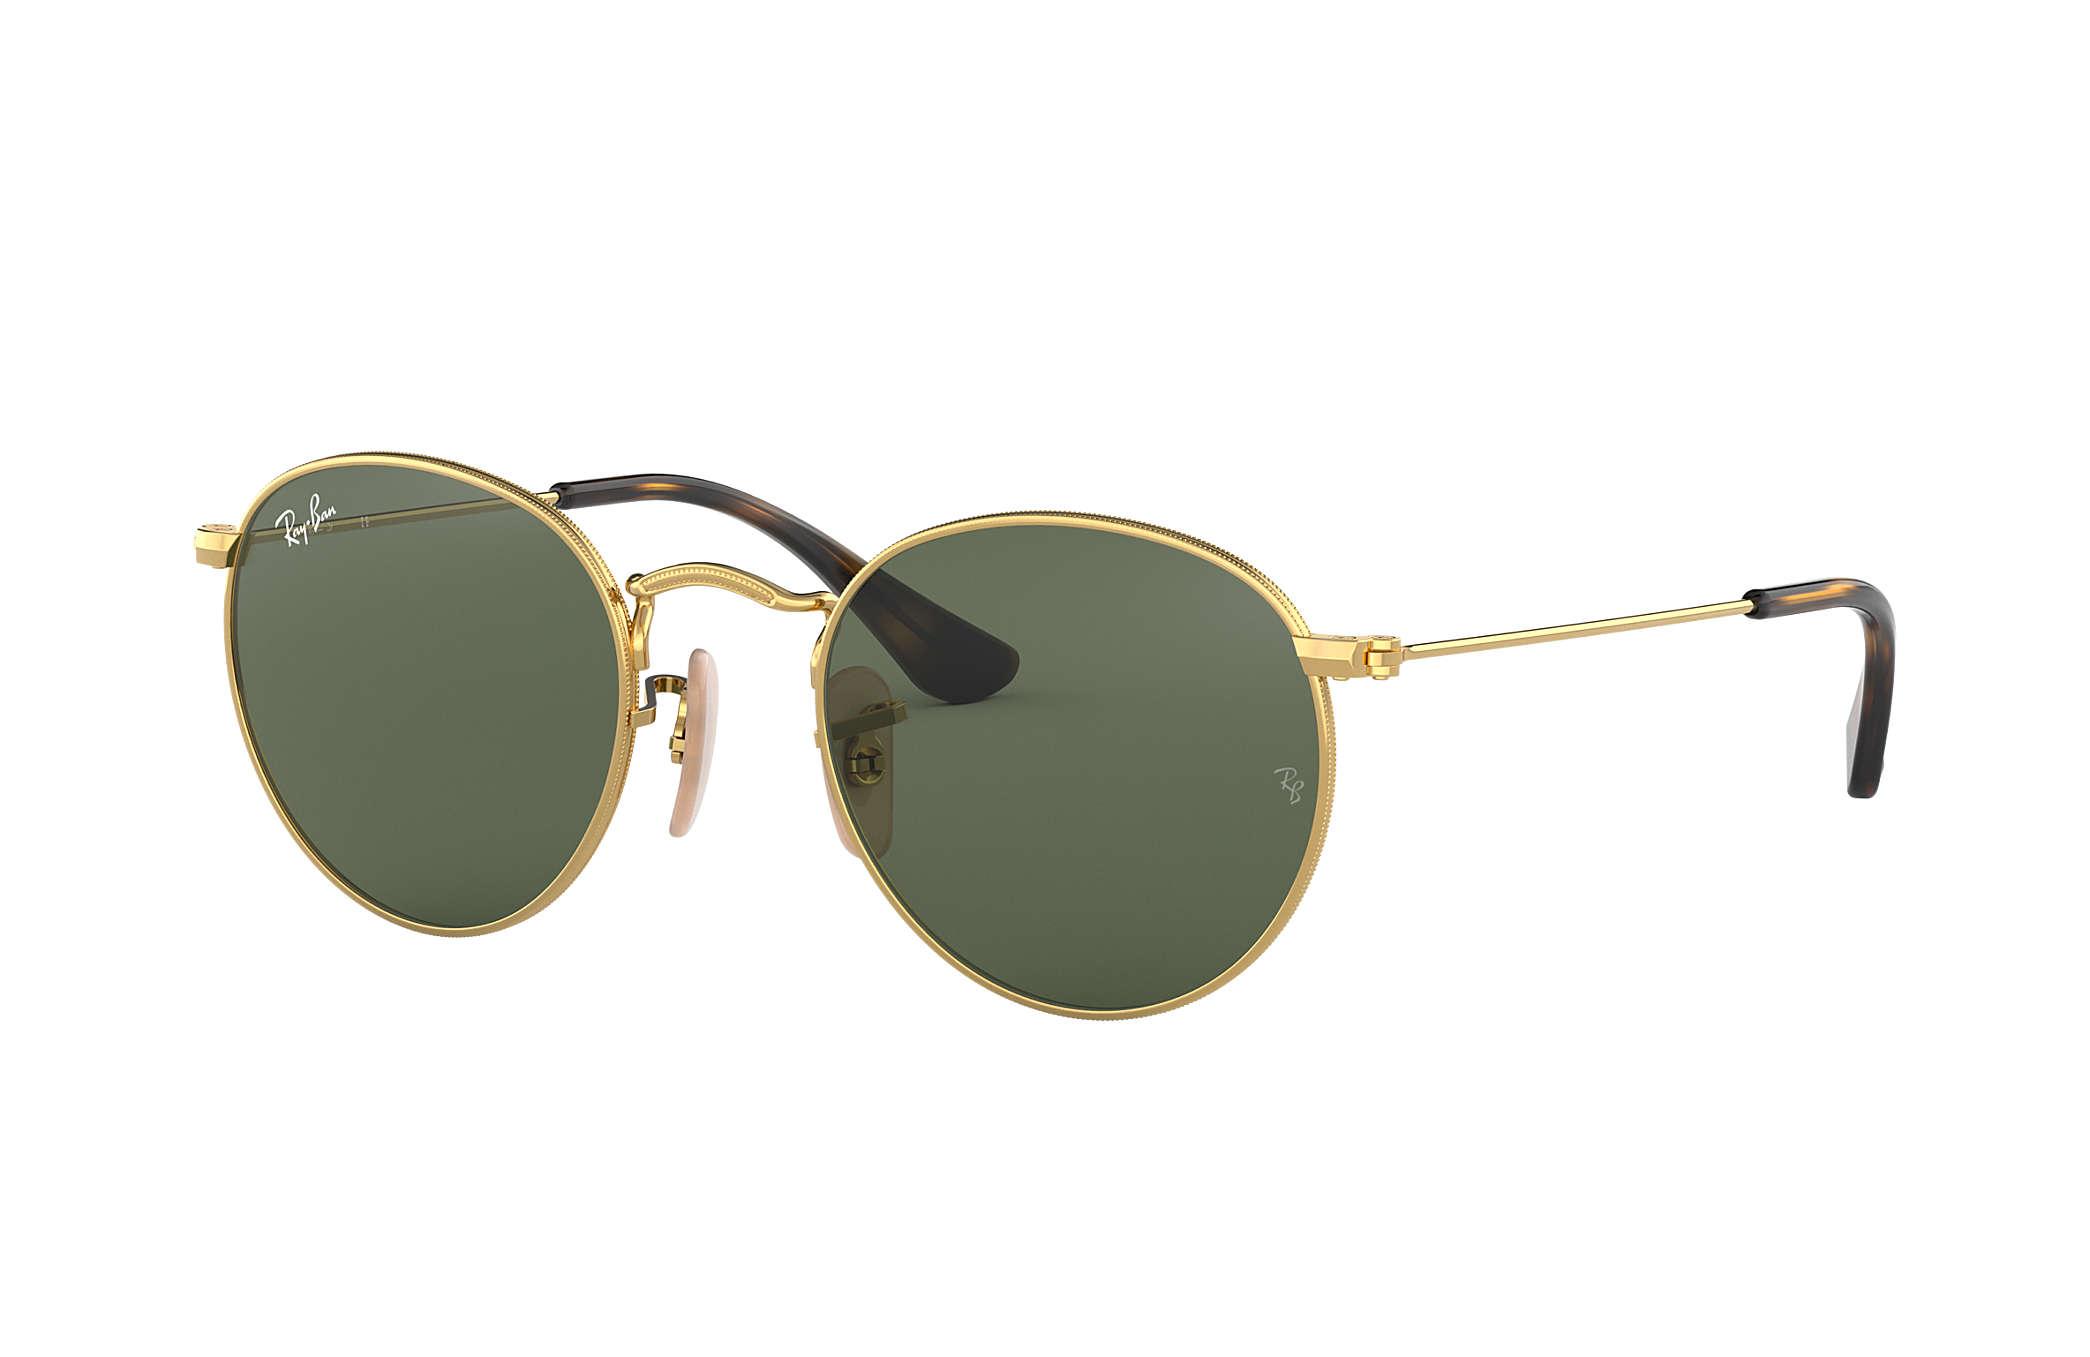 ray ban junior sunglasses australia